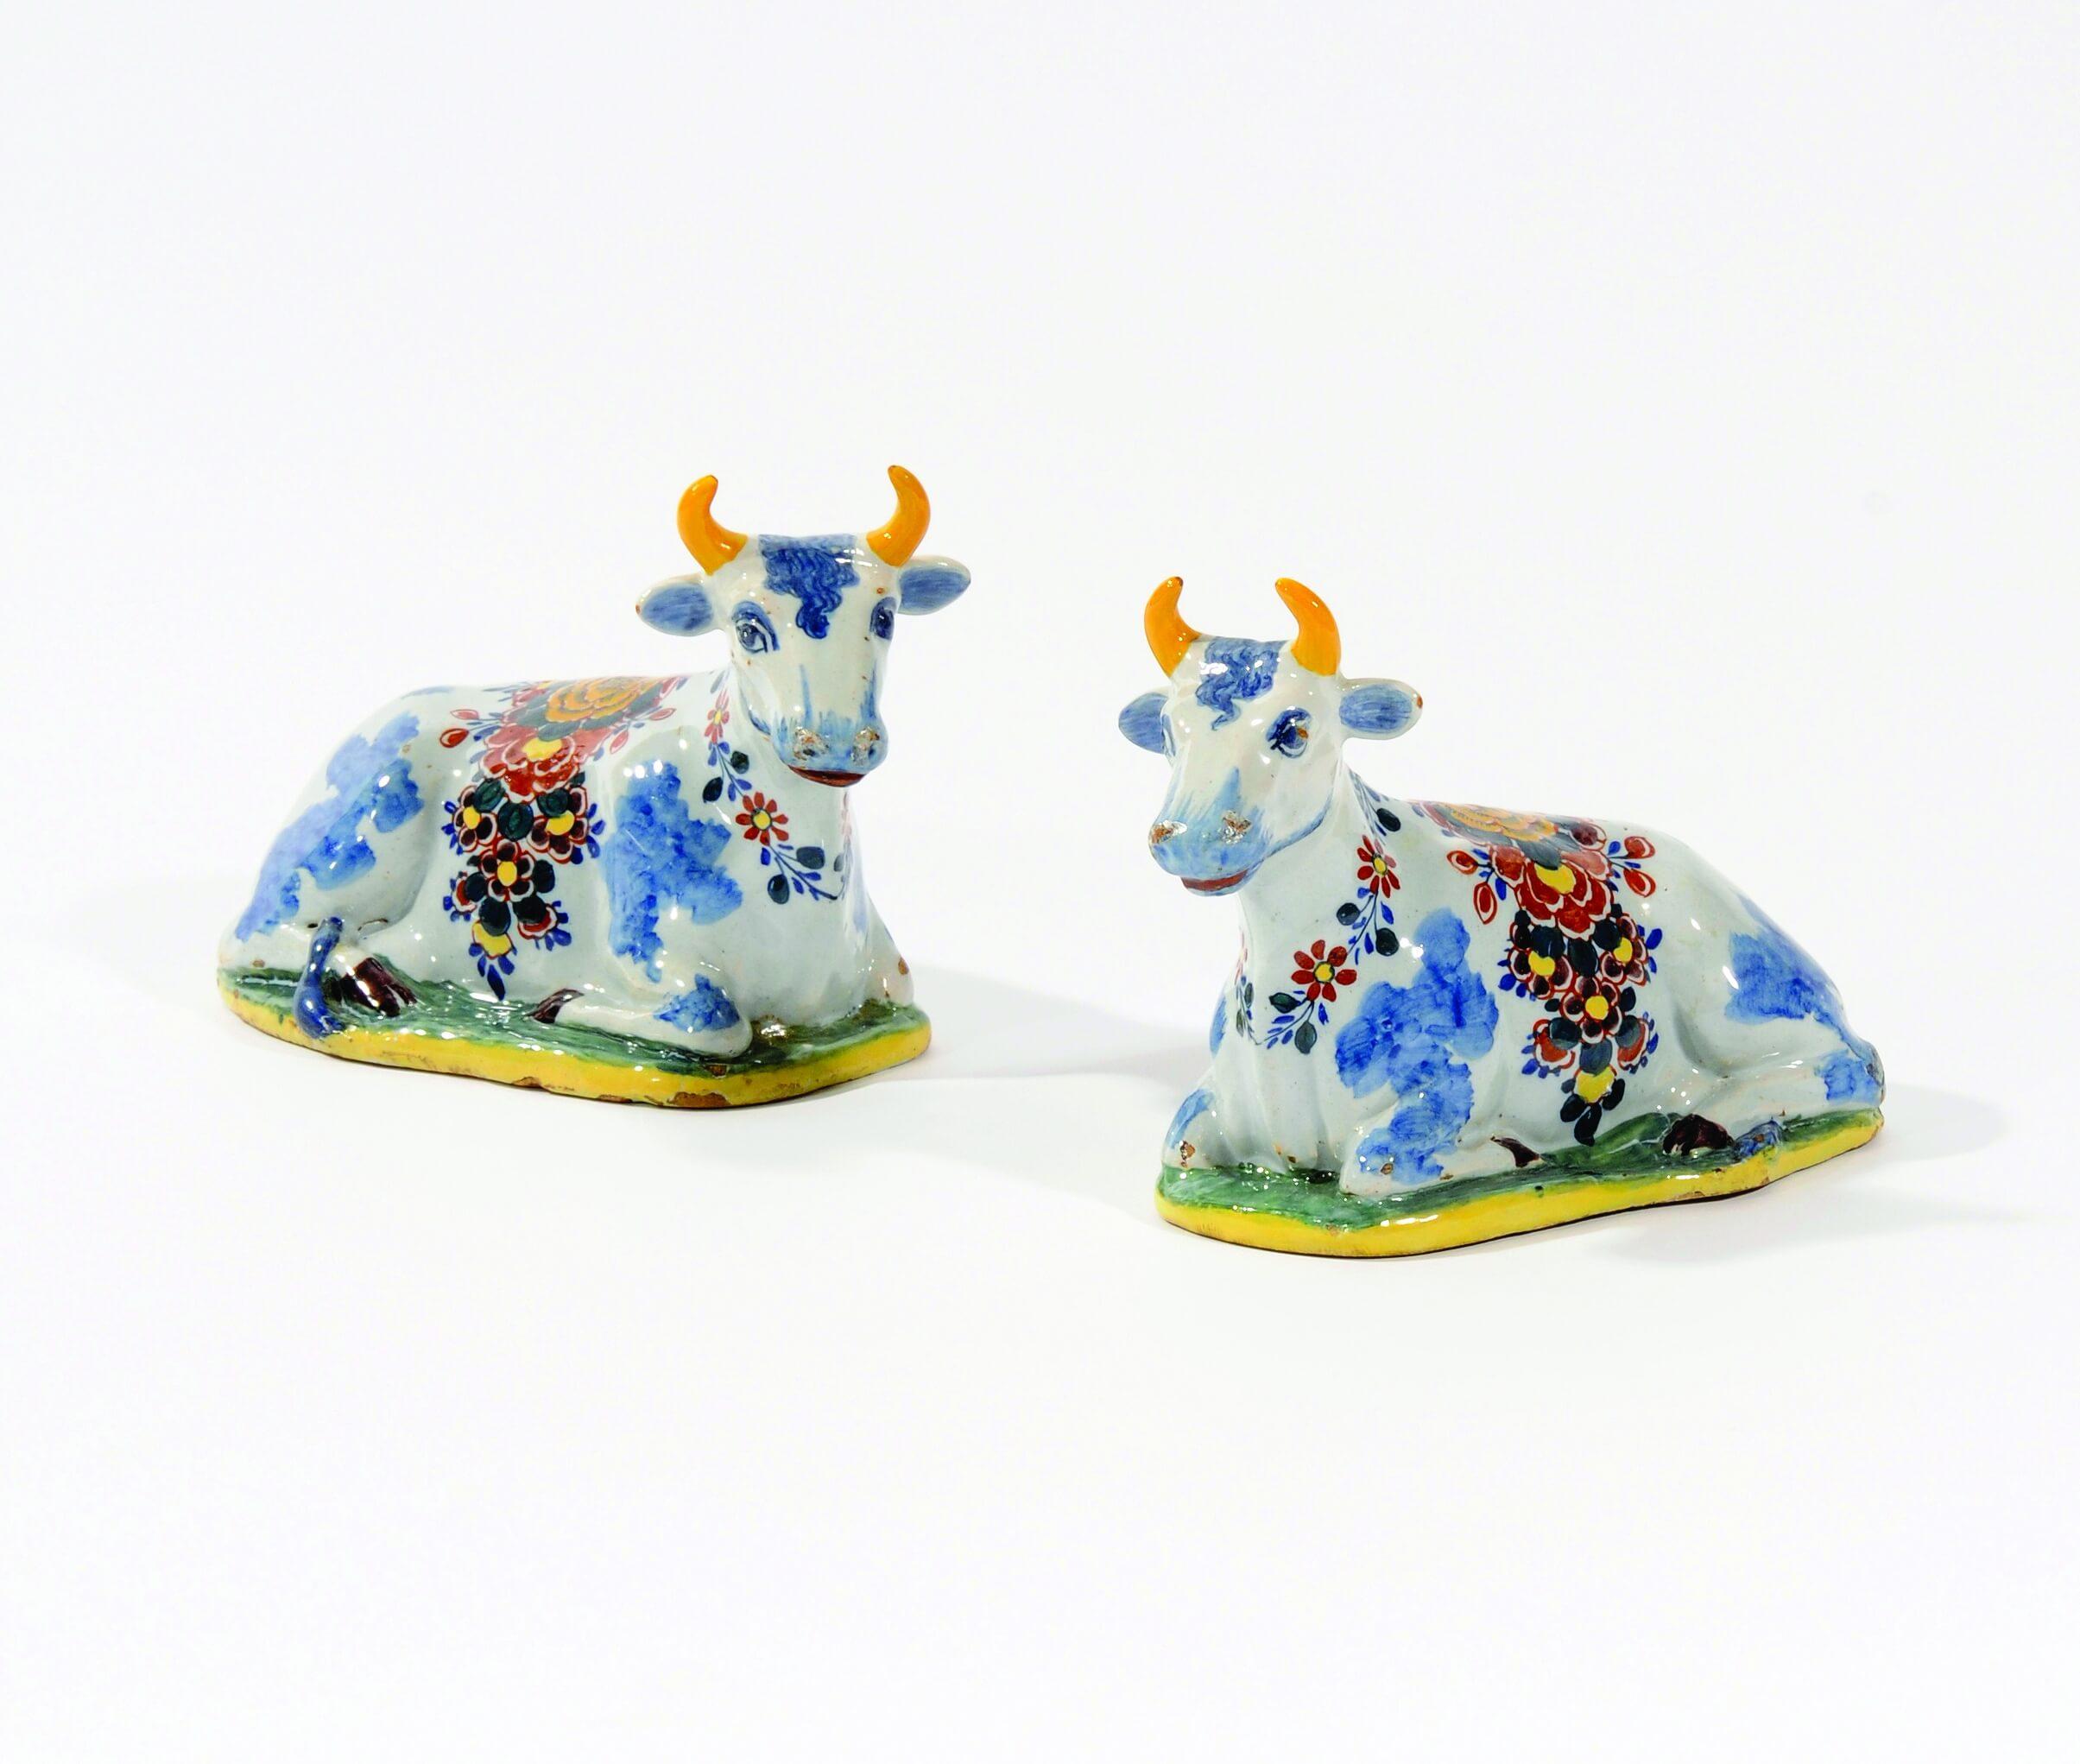 1086 Pair of Recumbent Cows